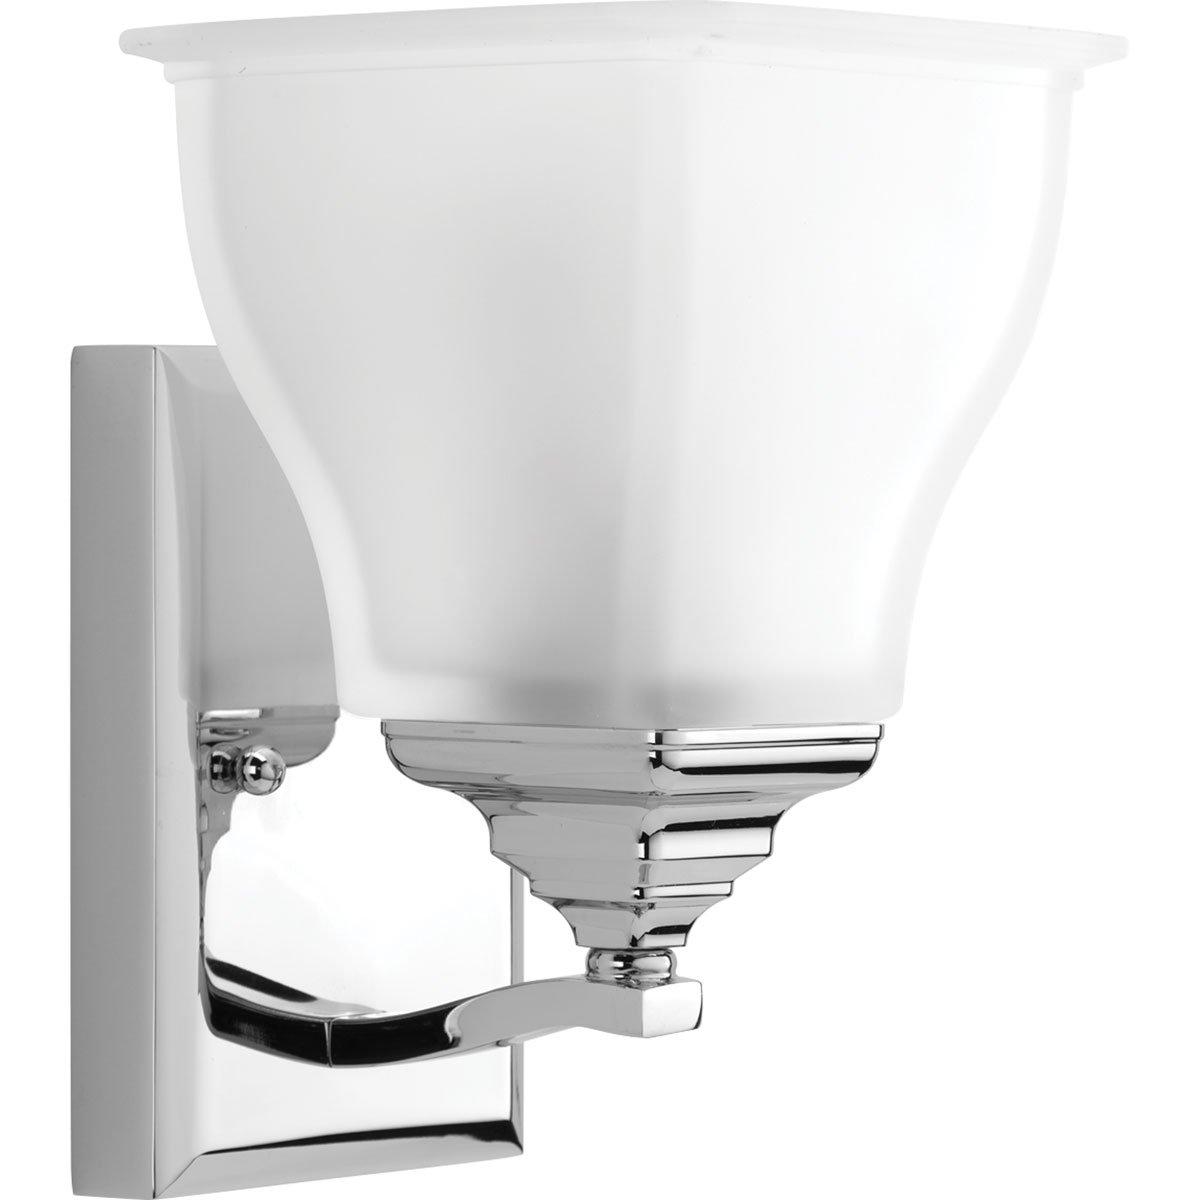 Progress Lighting P2175-15 1-100W Medium Base Bath Bracket, Polished Chrome